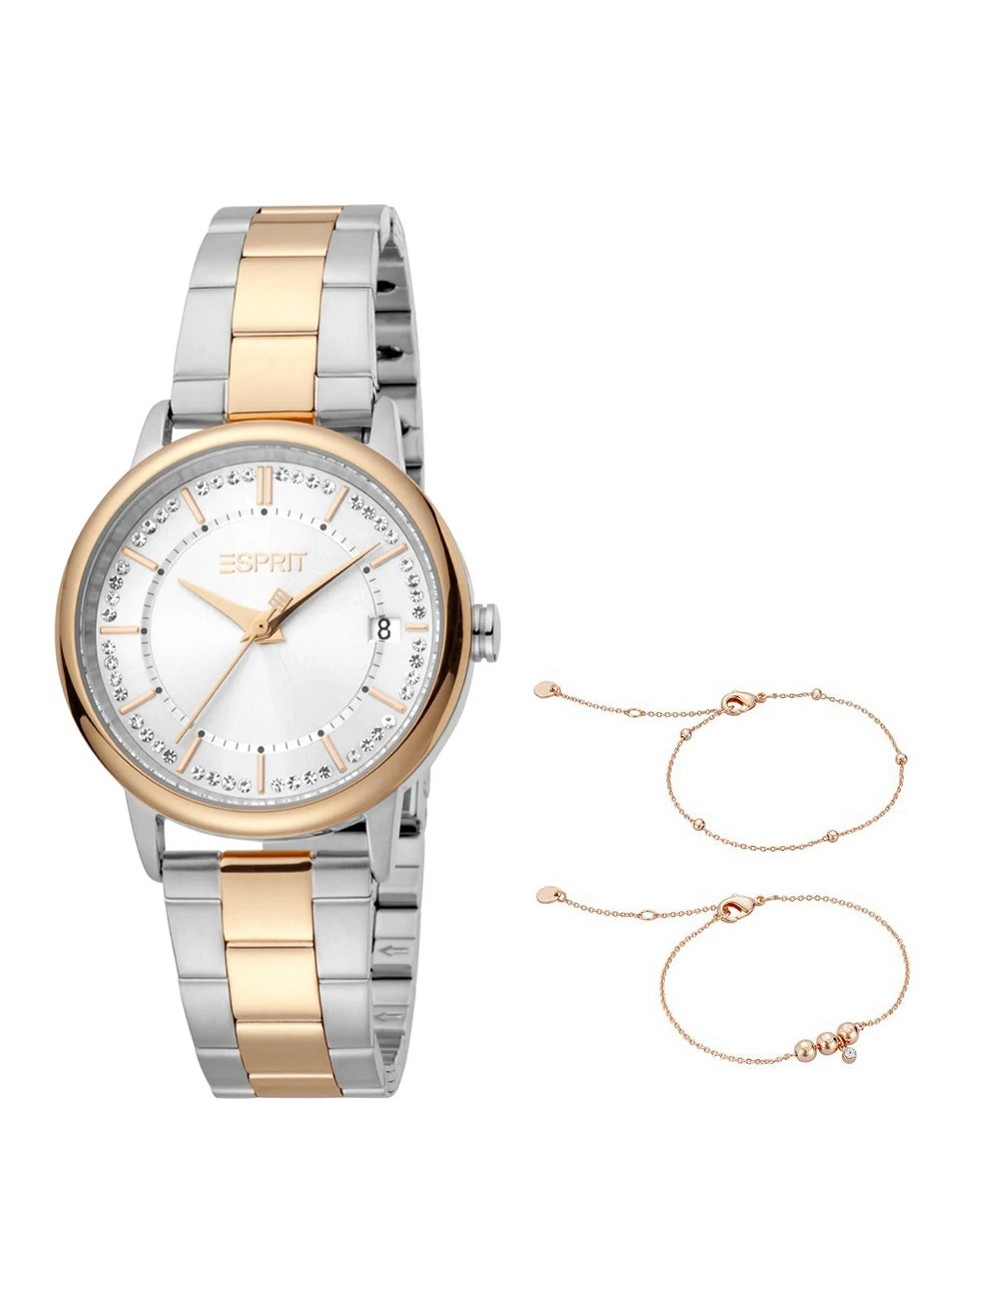 Esprit ES1L181M2095 Harper Silver Two Tone MB Ladies Watch